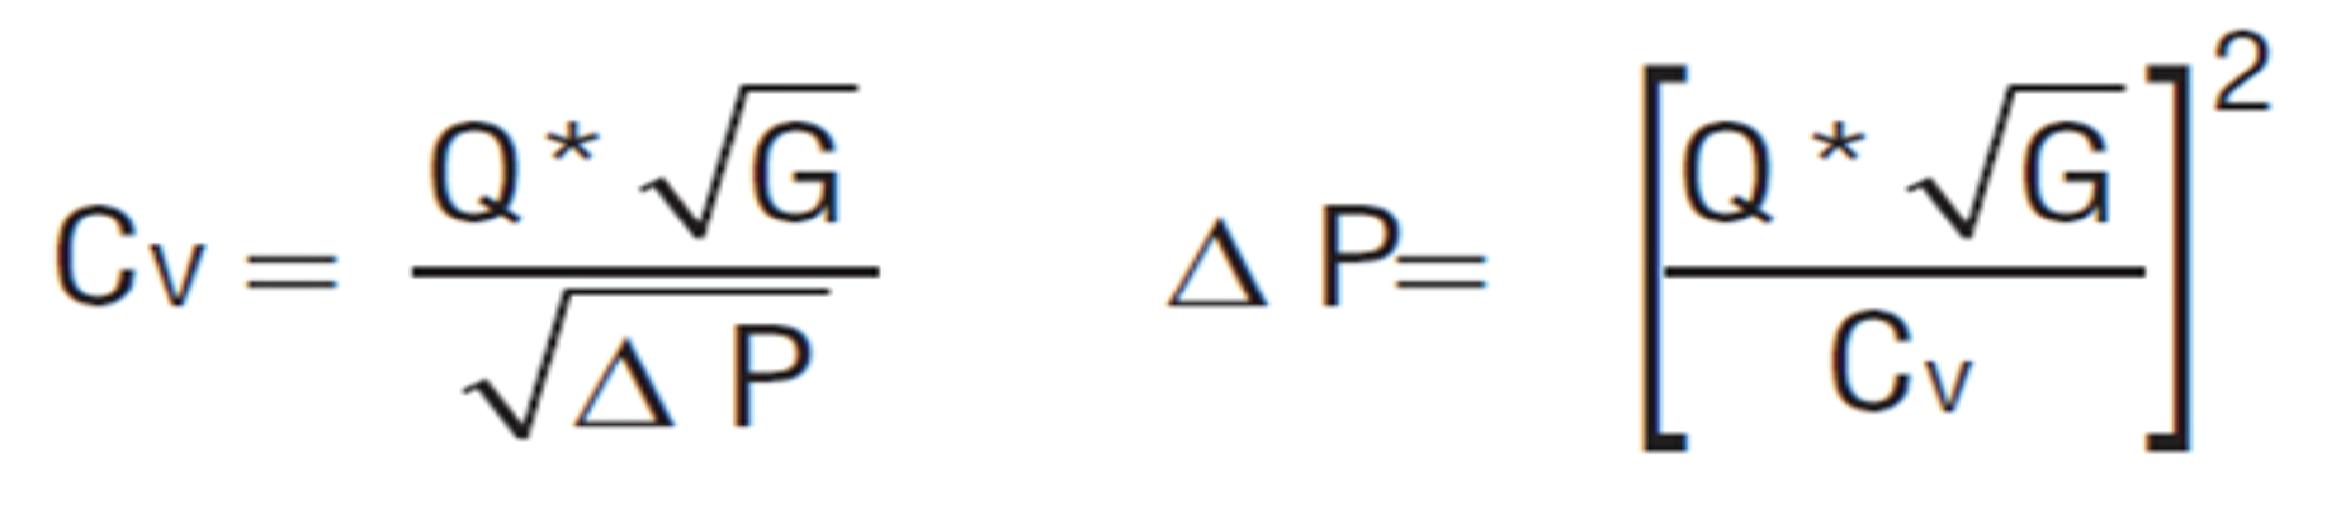 cv-calculation